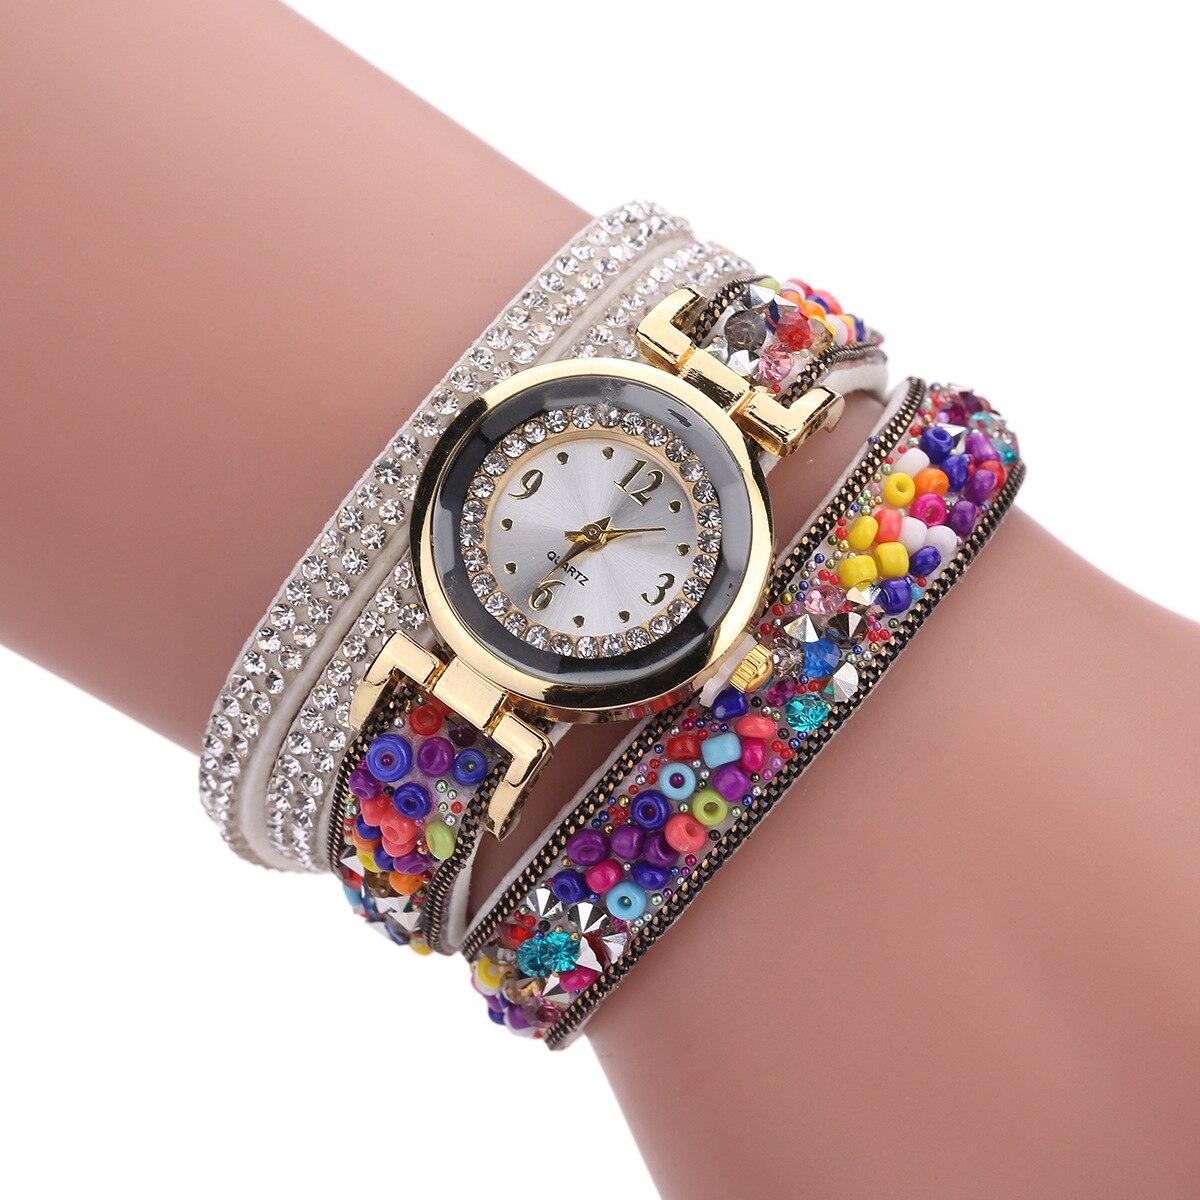 Fashion Luxury Leather Watch Kvinnor Classic Crystal Decor Armband - Damklockor - Foto 3